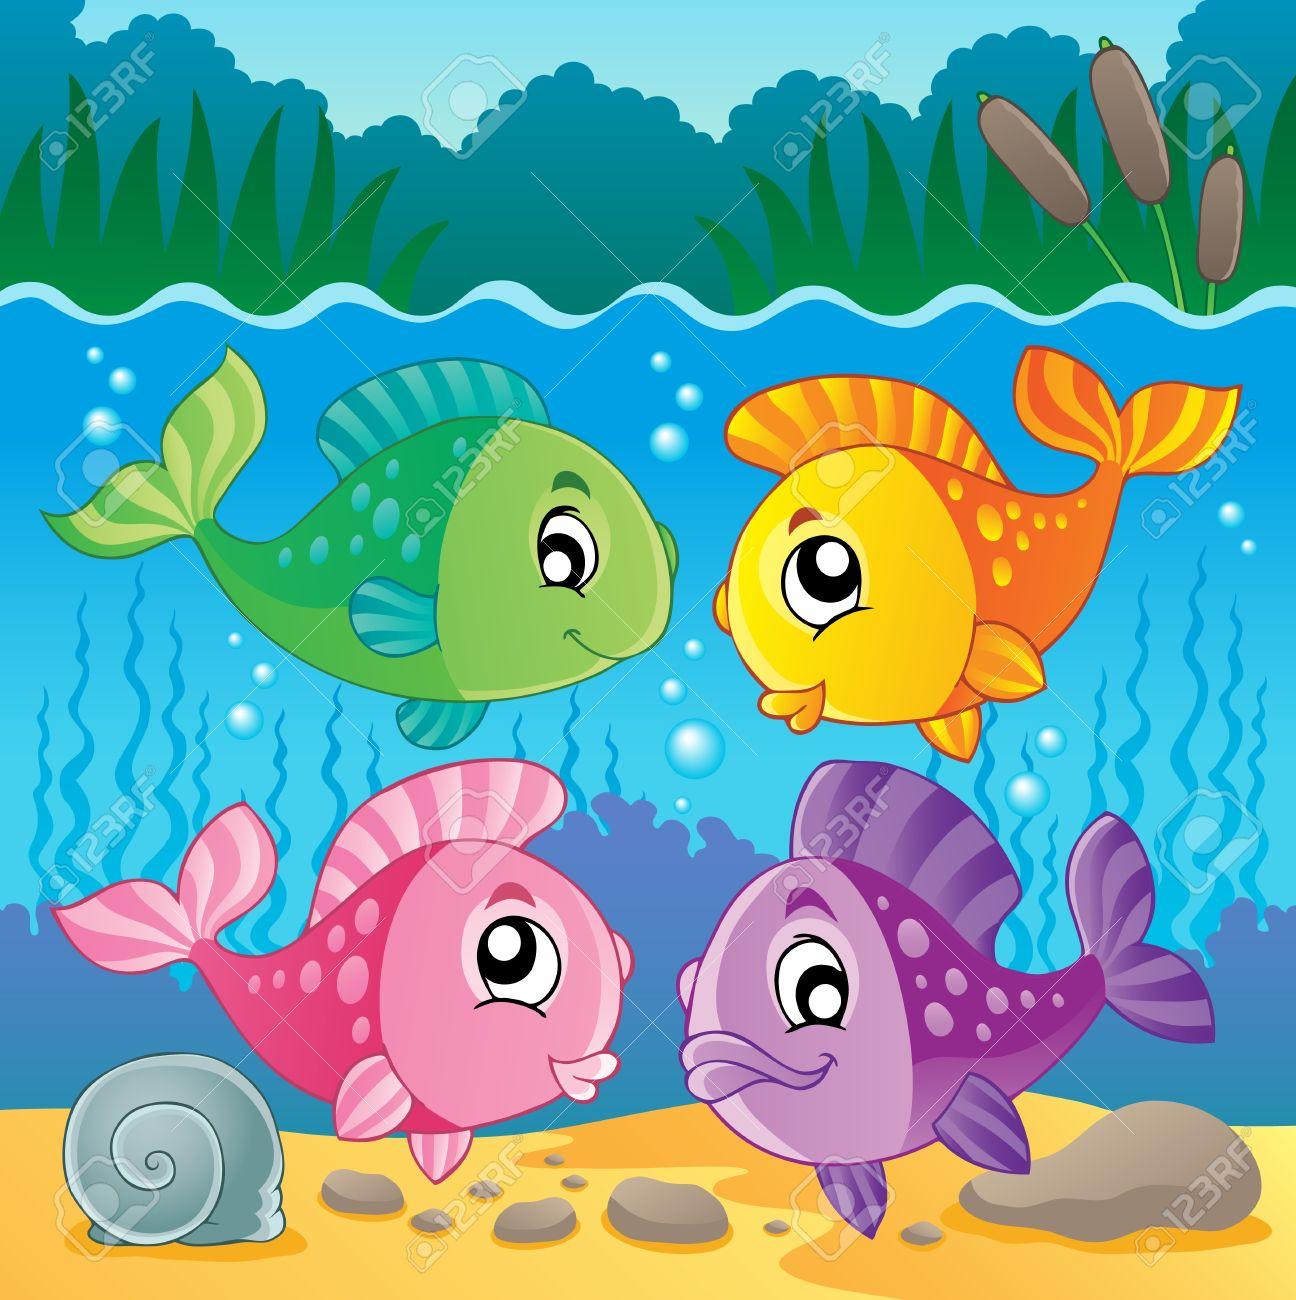 Freshwater fish art - Freshwater Fish Theme Image Stock Vector 17794525